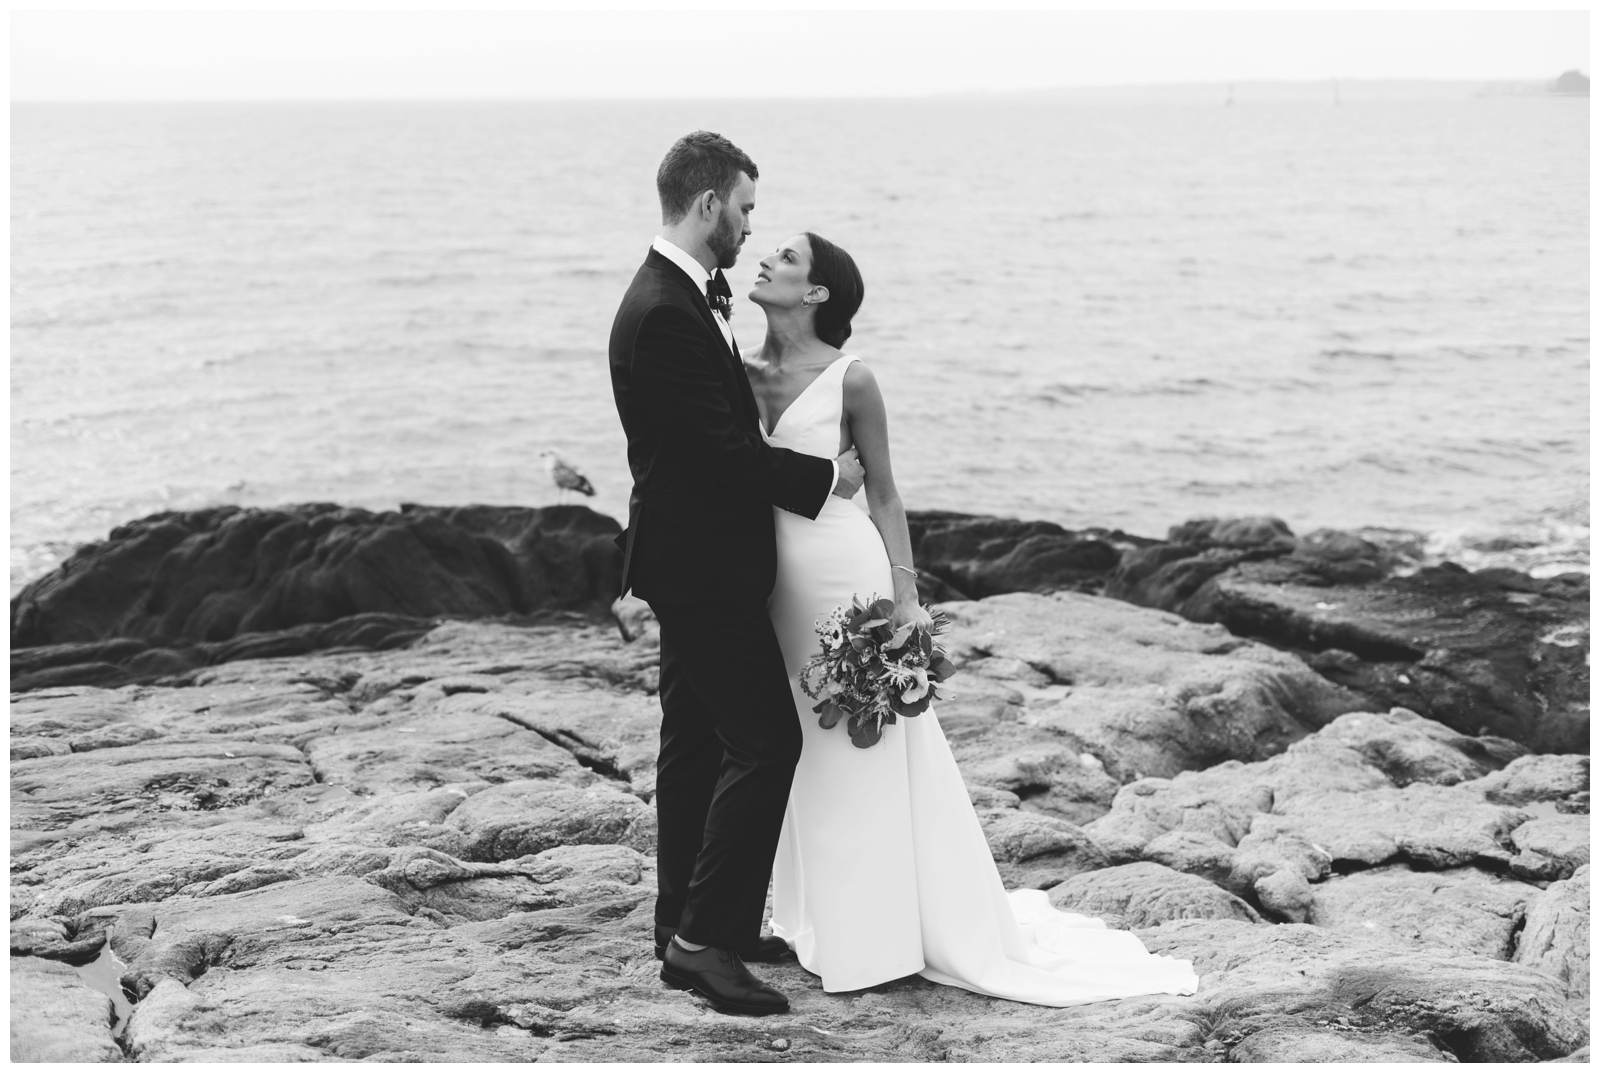 Madison-Beach-Hotel-Wedding-Bailey-Q-Photo-Boston-Wedding-Photographer-013.jpg